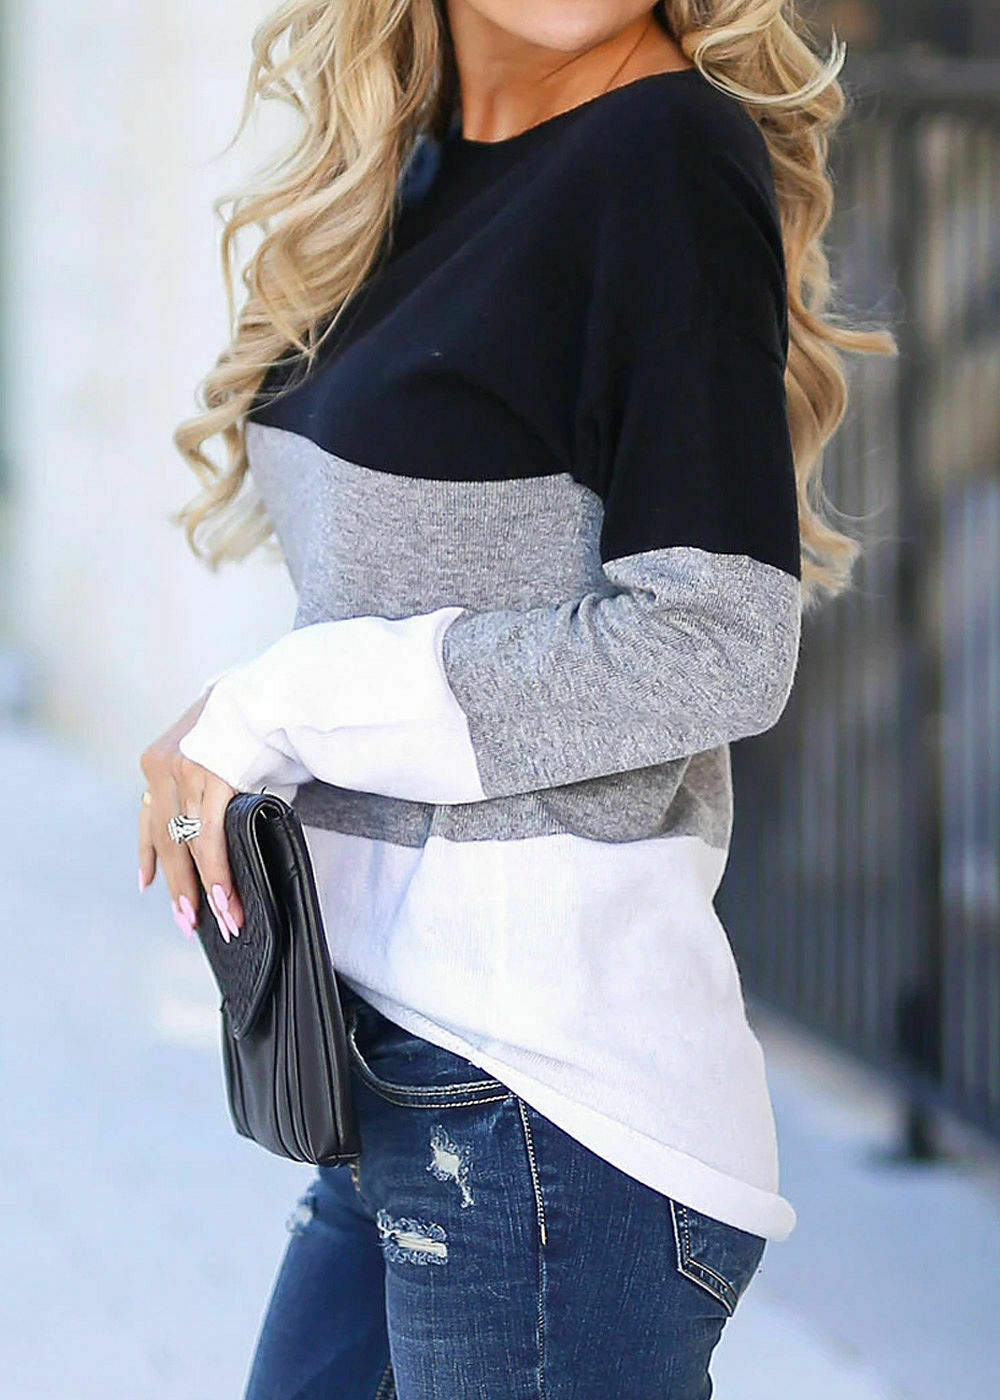 29% OFF B19116886 Damen Violet Pullover Colorblock Sweater Vokuhila schwarz grau